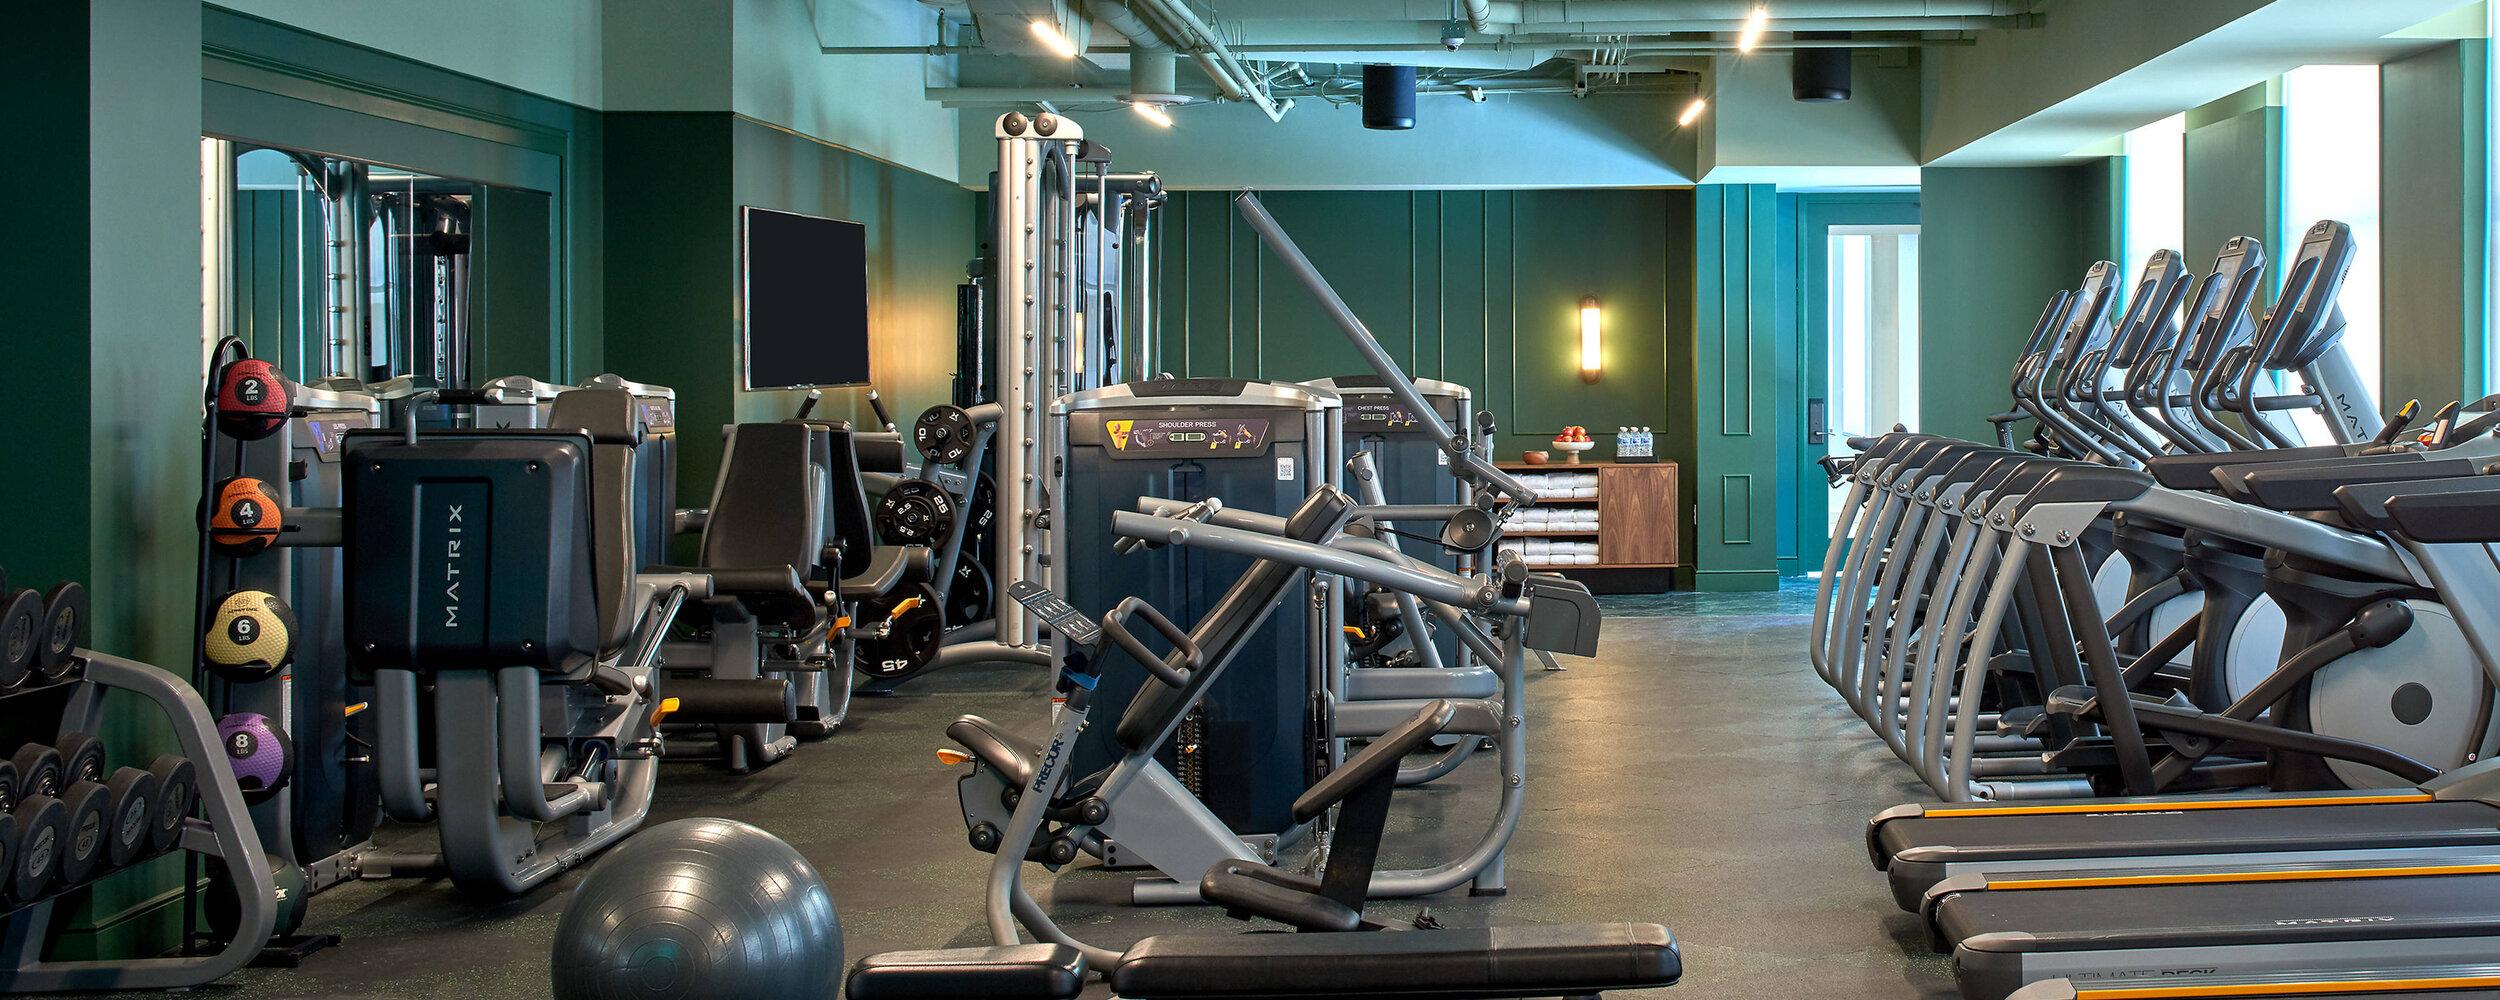 mspak-fitness-4790-hor-feat.jpg